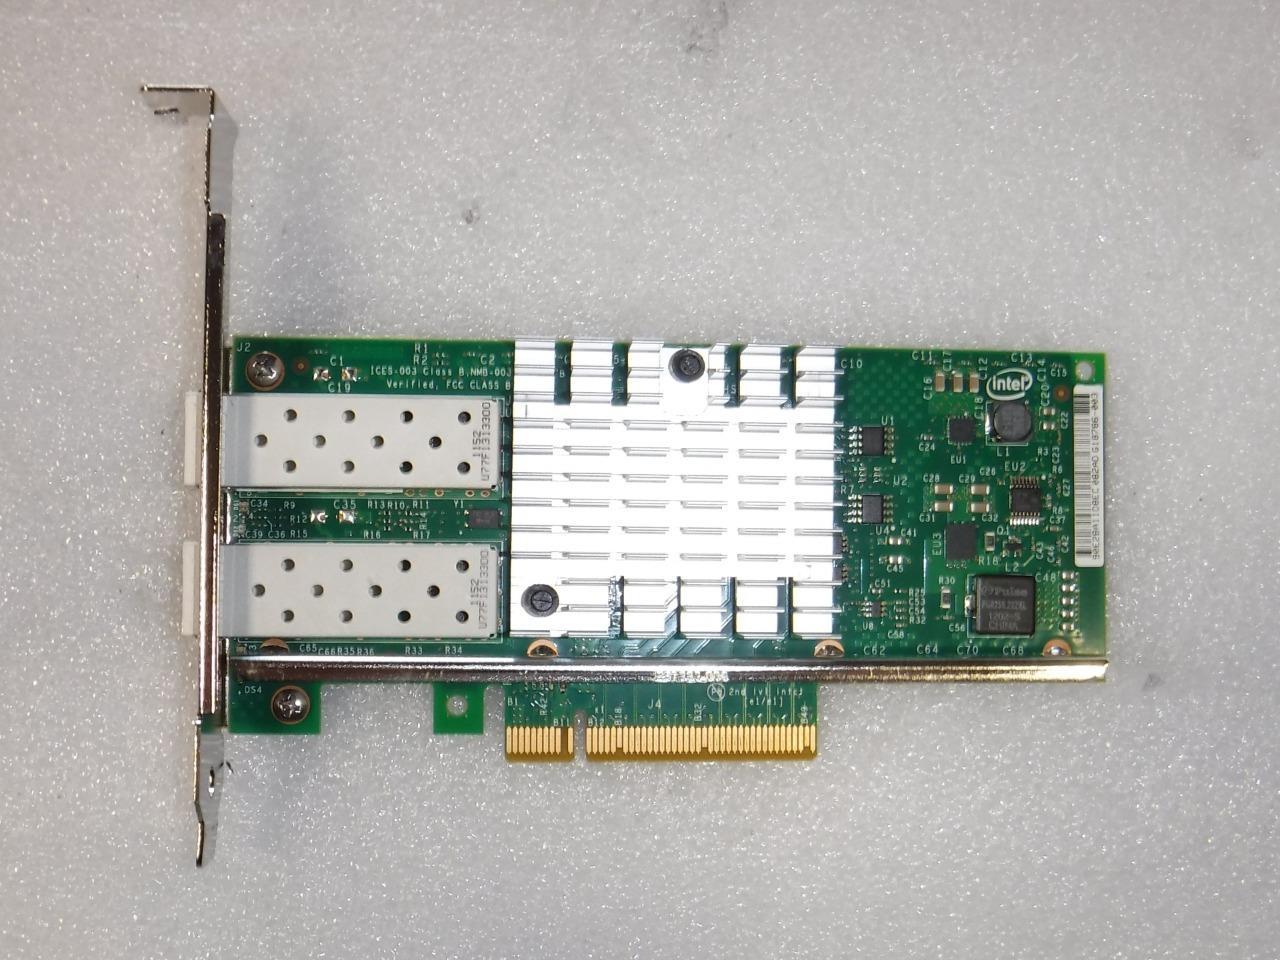 Details about Dell DP/N 0VFVGR VFVGR Intel X520-DA2 10Gb SFP+ Dual Port  PCI-e Network Card